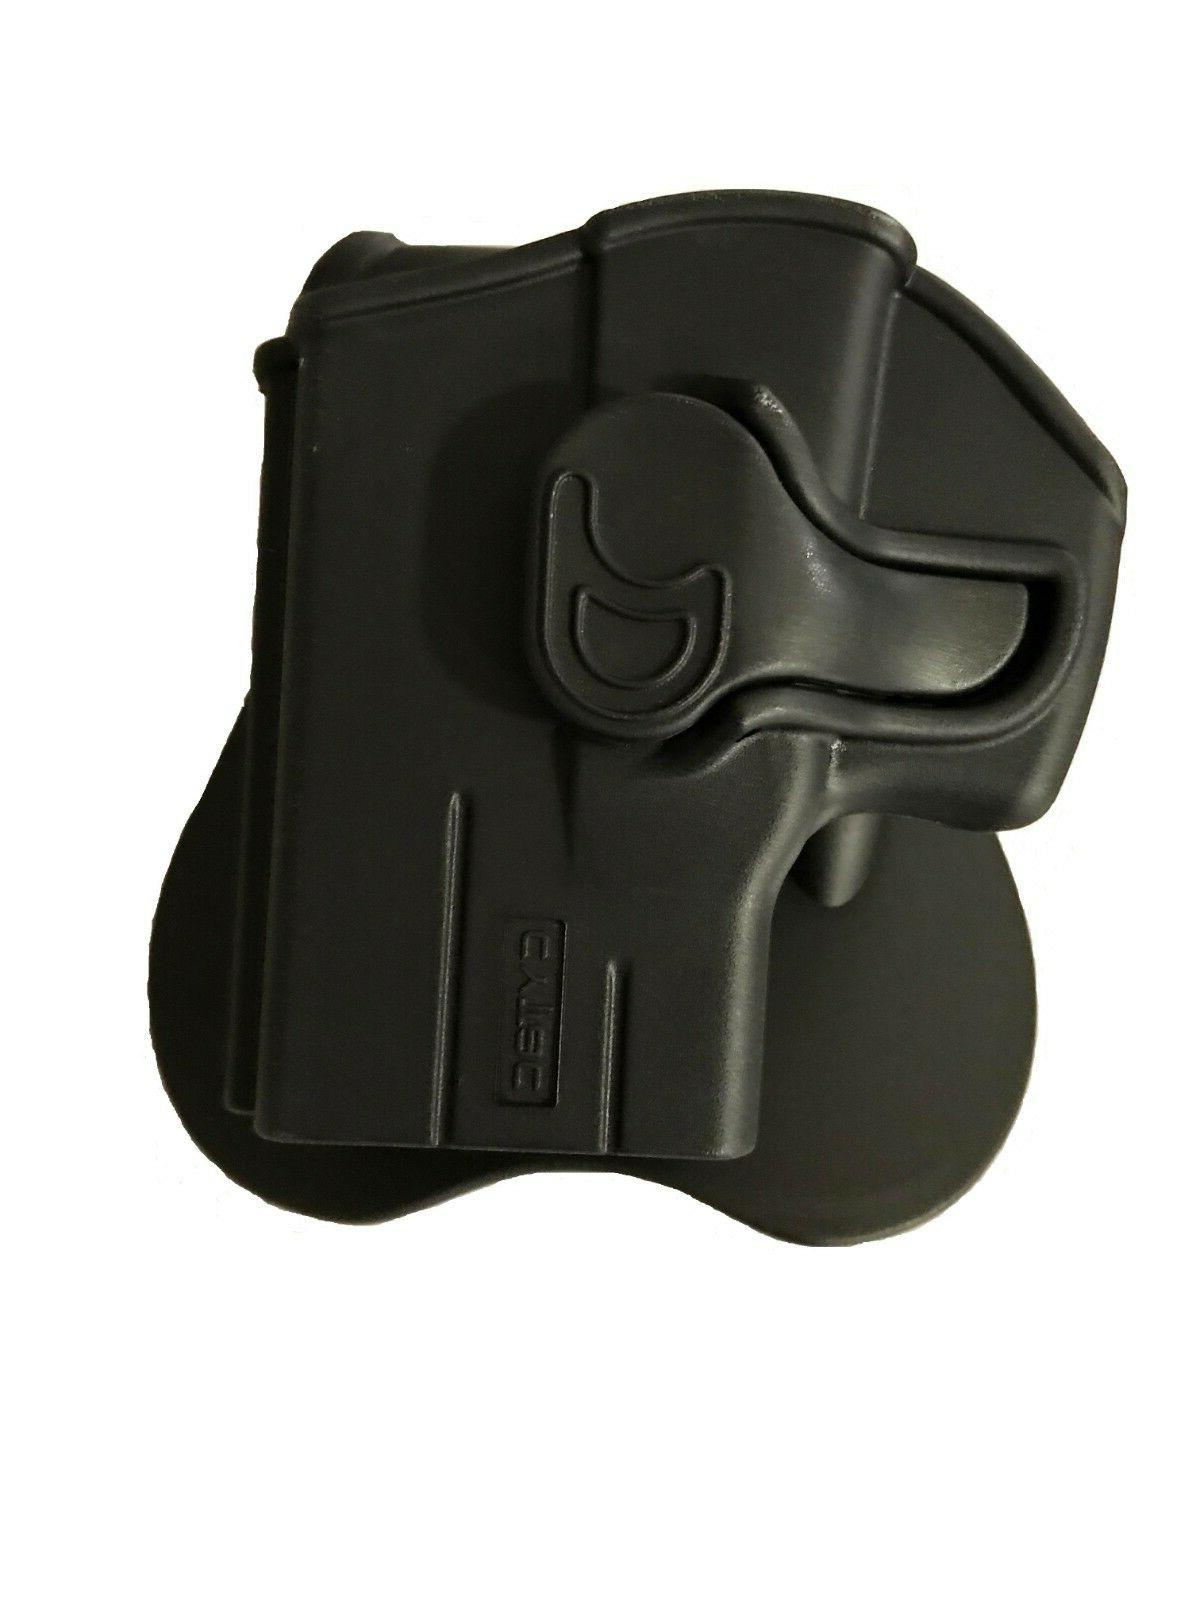 rapid release owb kydex paddle holster